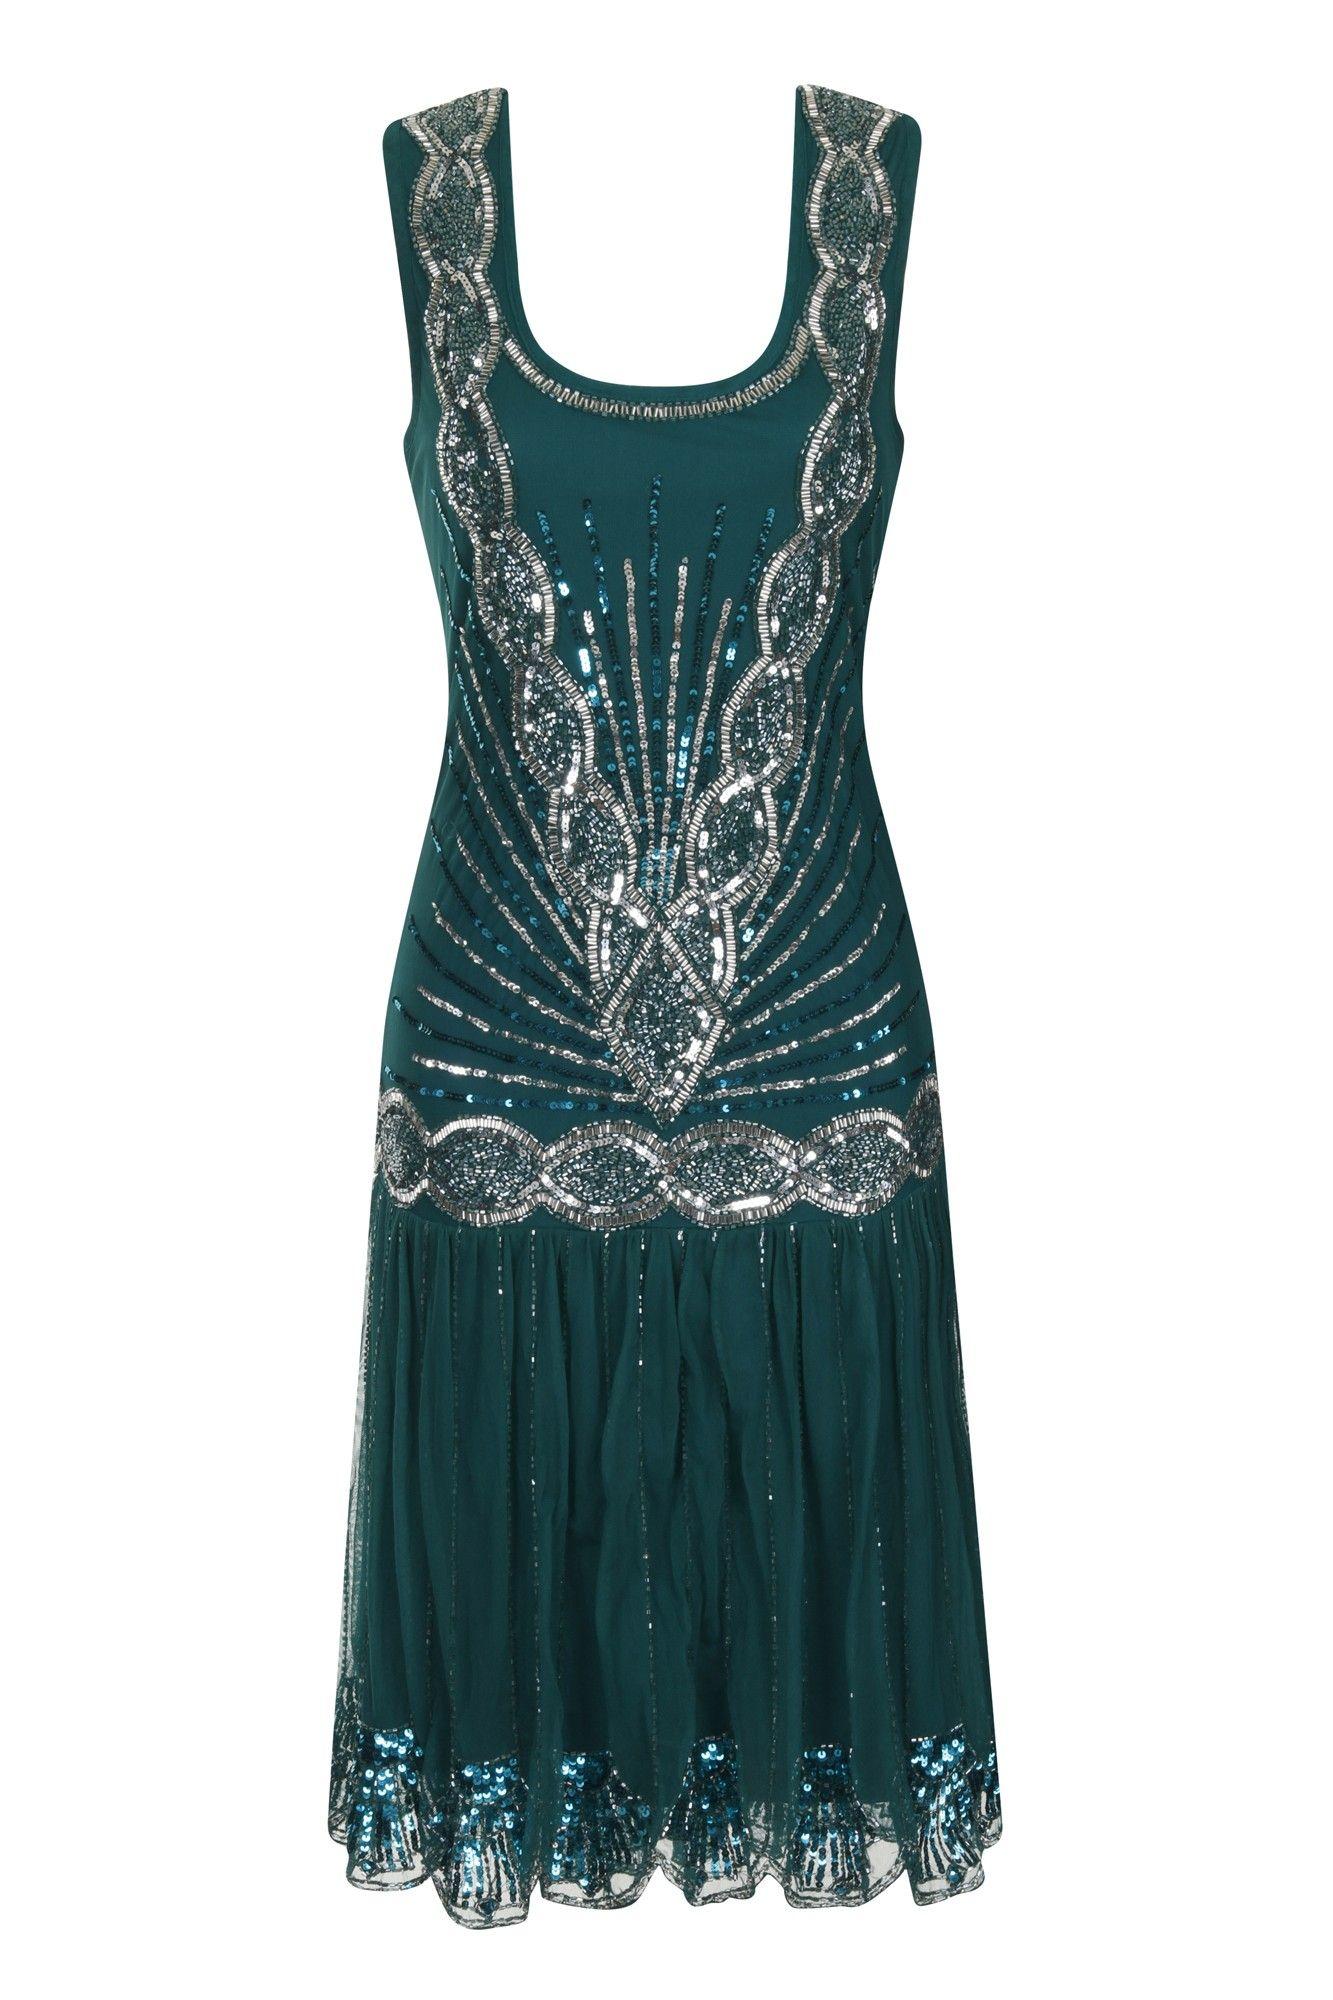 Emerald Dresses Dresses Couture Dress Zelda Fashion 20s Og Flapper nZx7WA